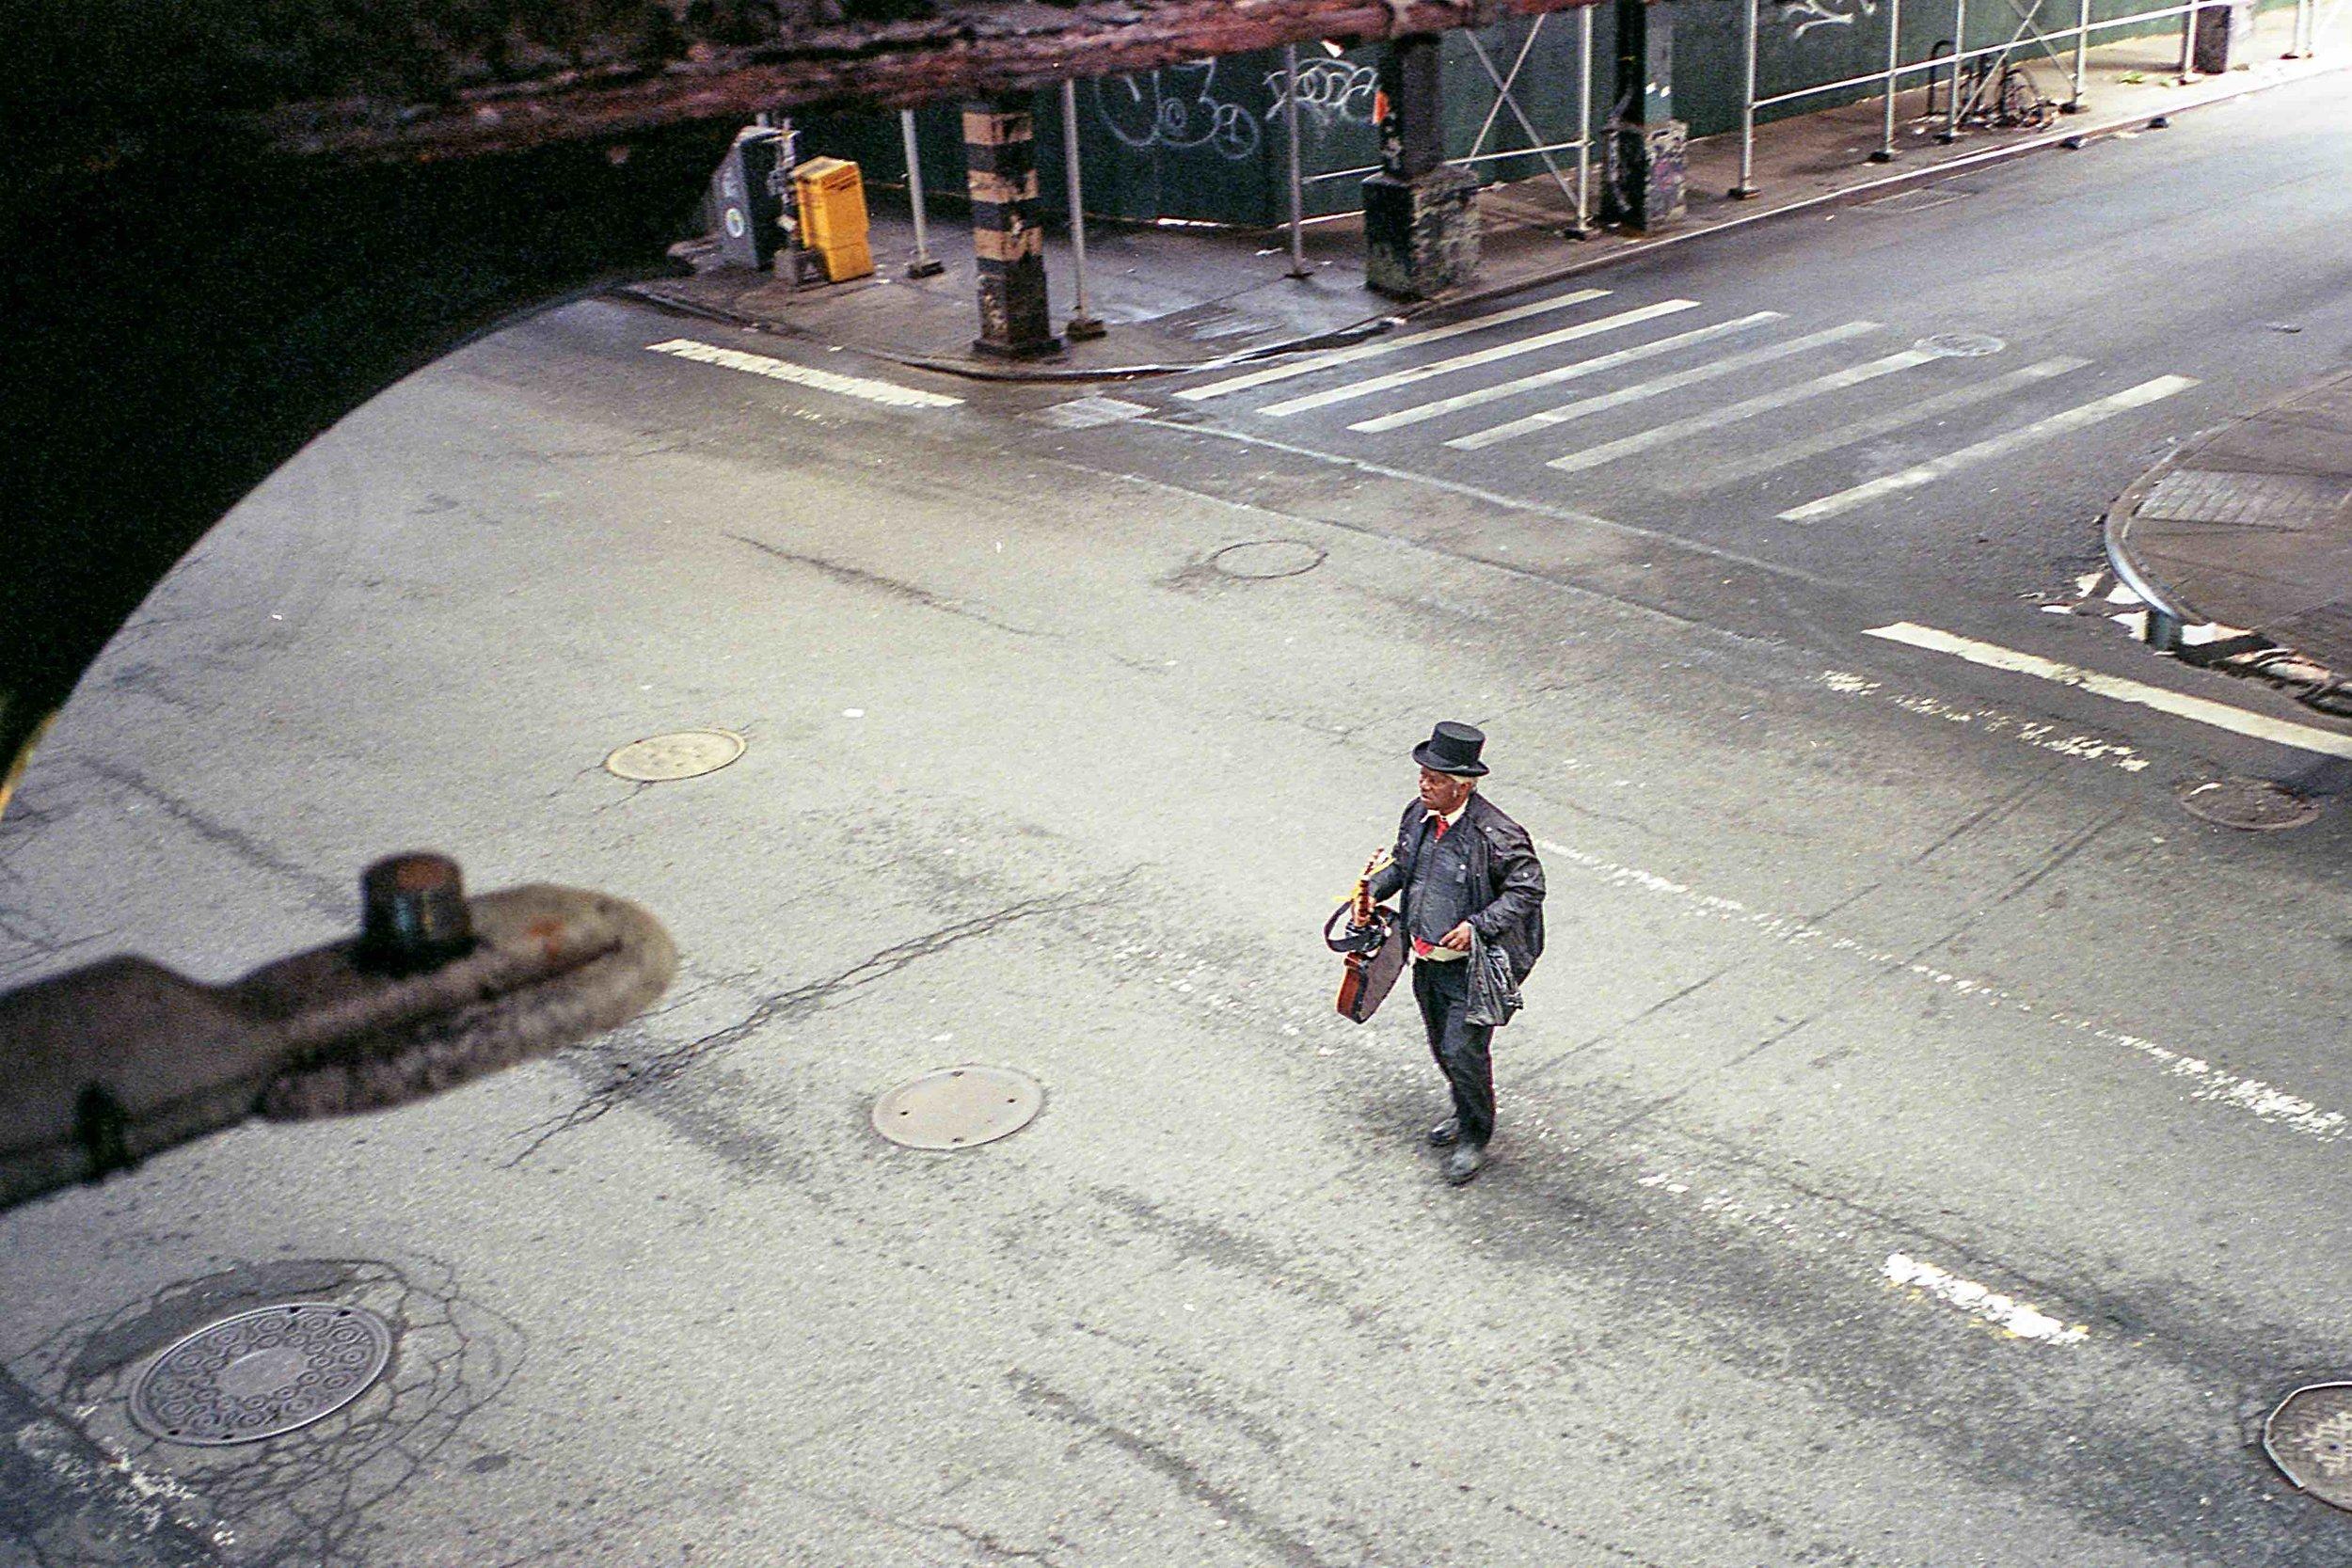 Matt Pittman / Leica M7 / Kodak Portra 400 / New York City